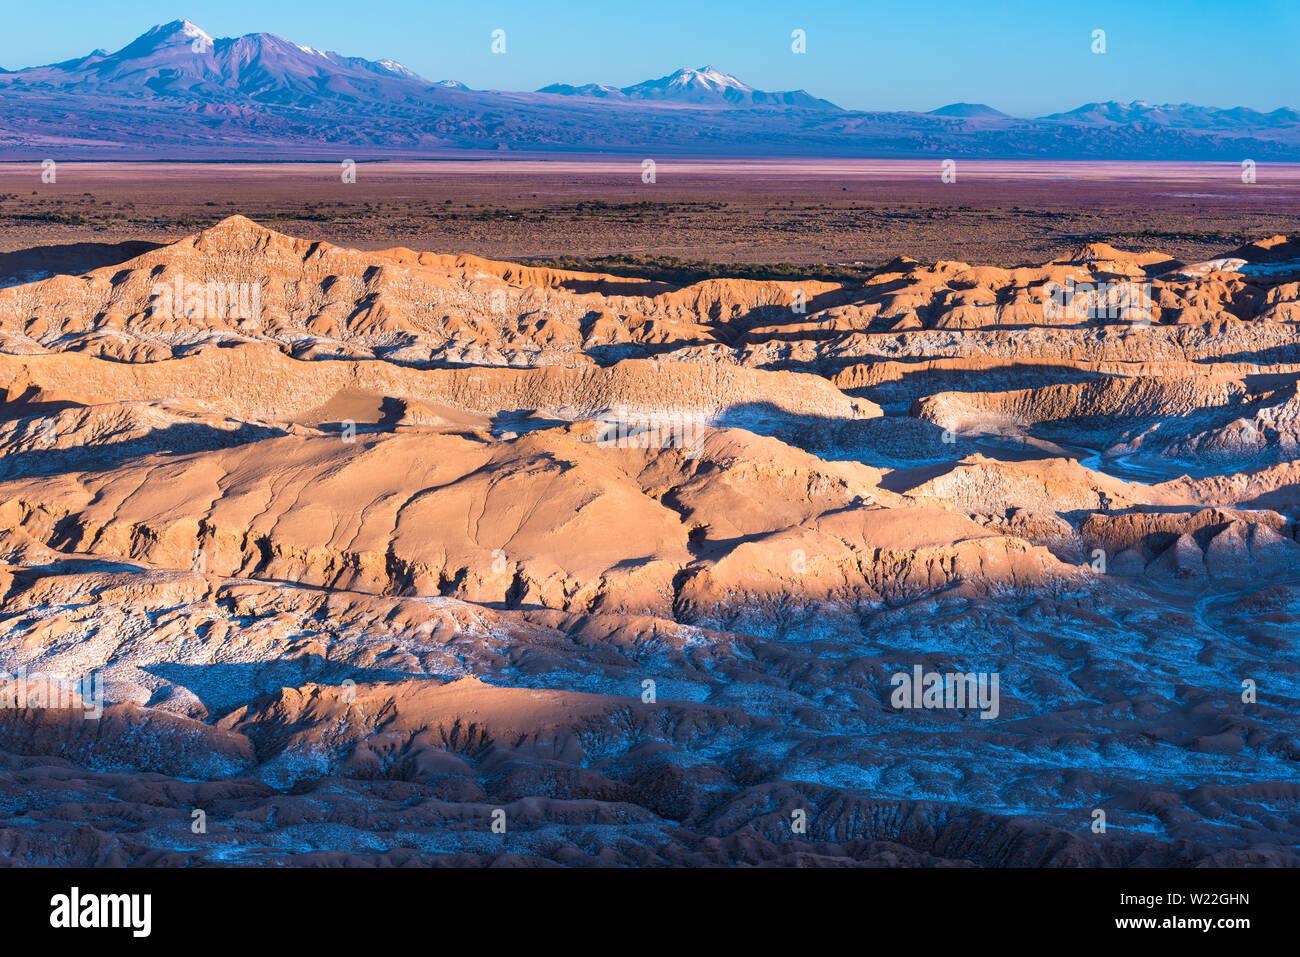 Salt formations at Valle de la Luna (spanish for Moon Valley), also know as Cordillera de la Sal (spanish for Salt Mountain Range), Los Flamencos Nati Stock Photo